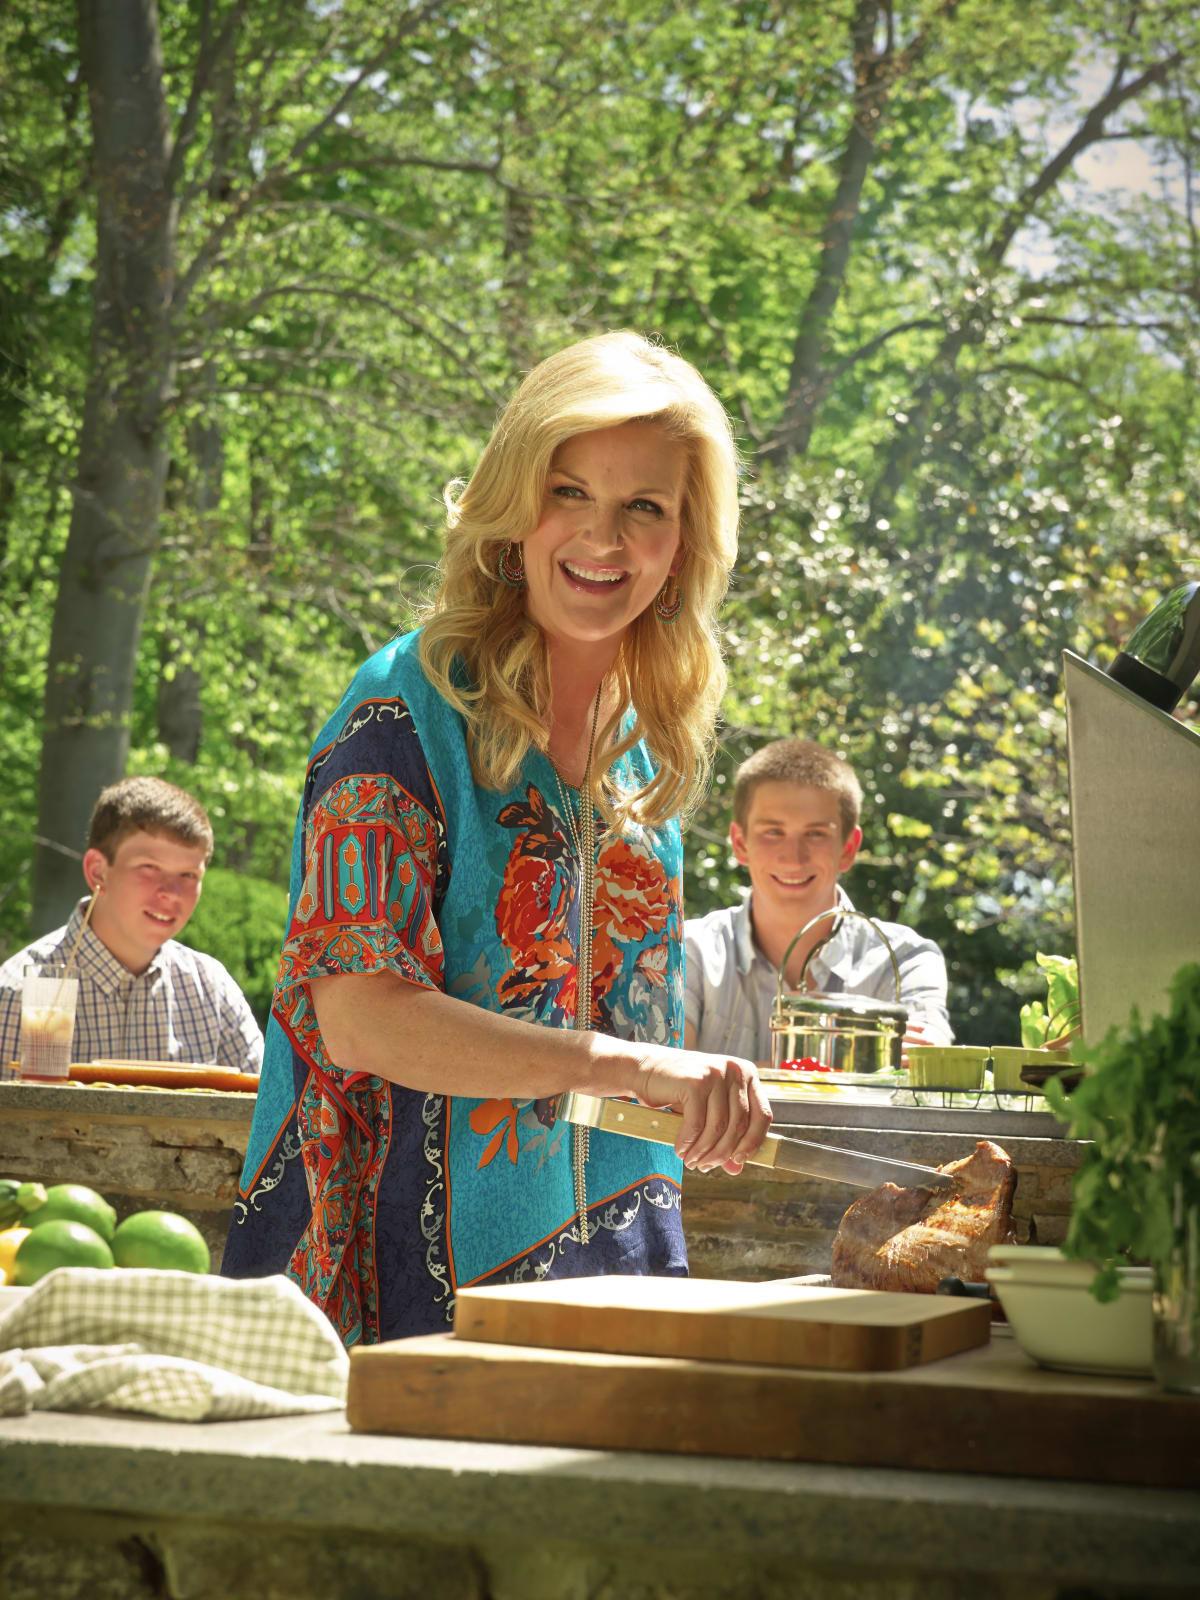 Trisha Yearwood cooking